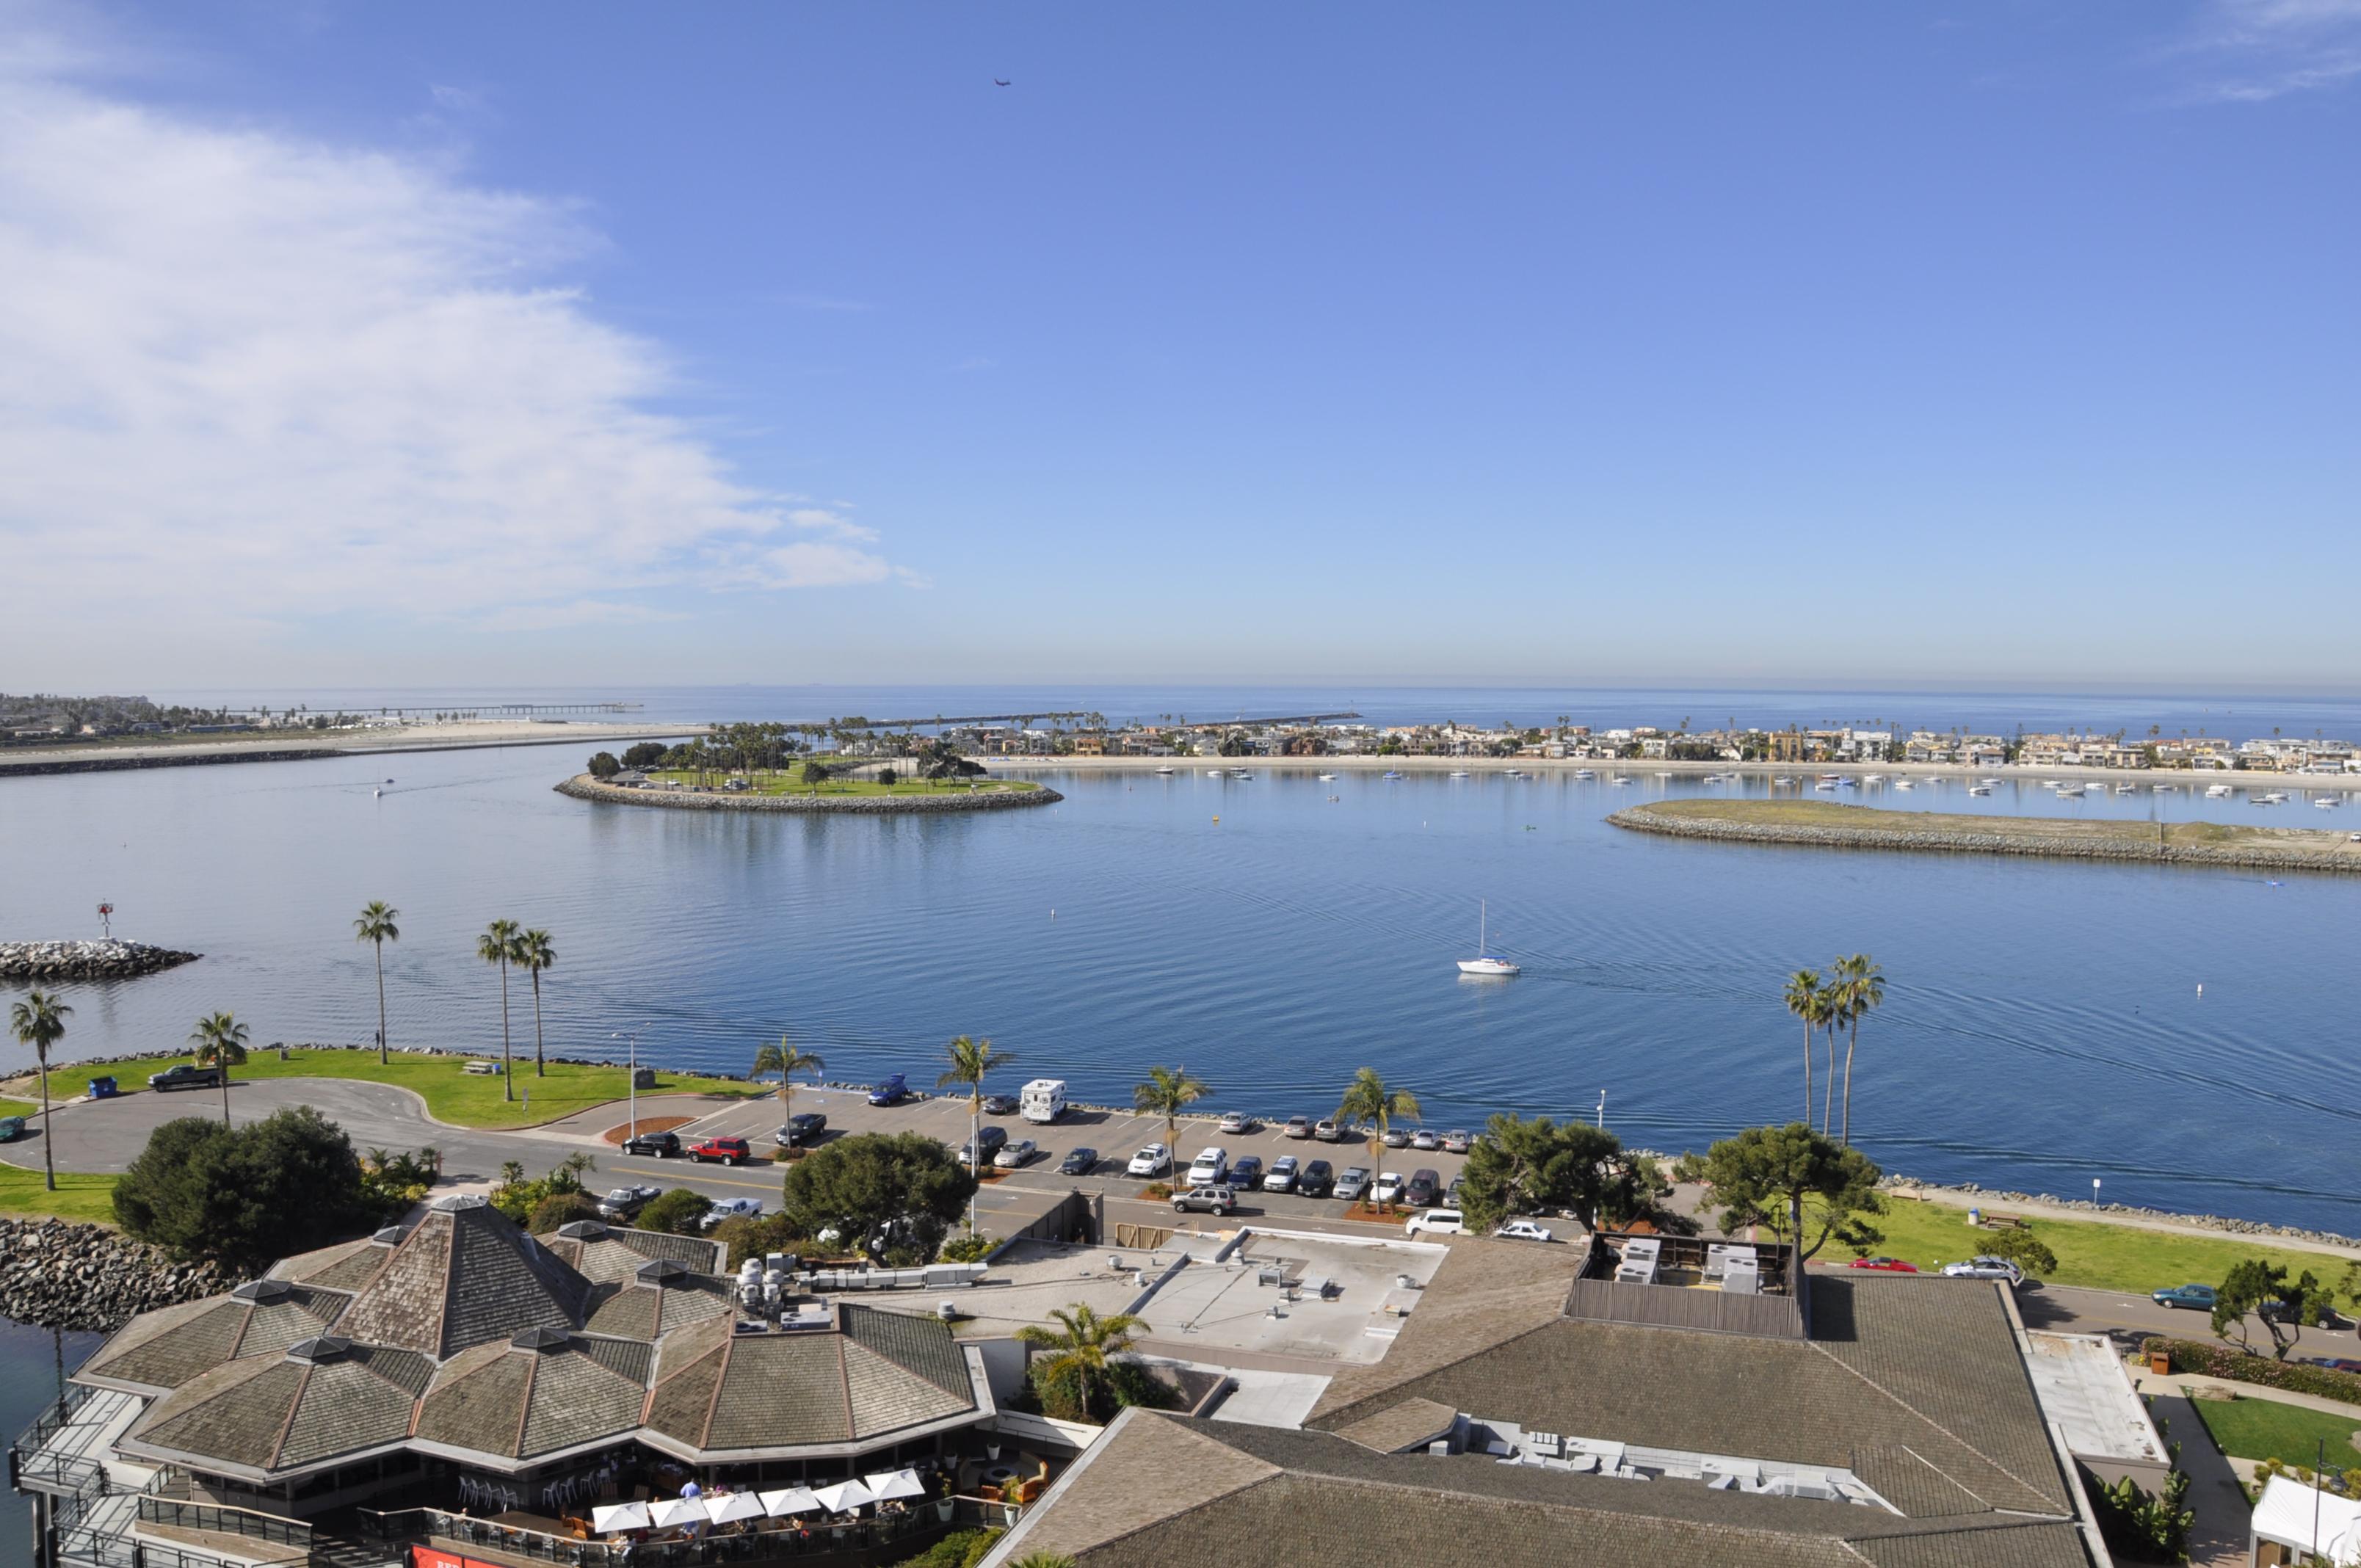 The Hyatt Regency Mission Bay In San Diego